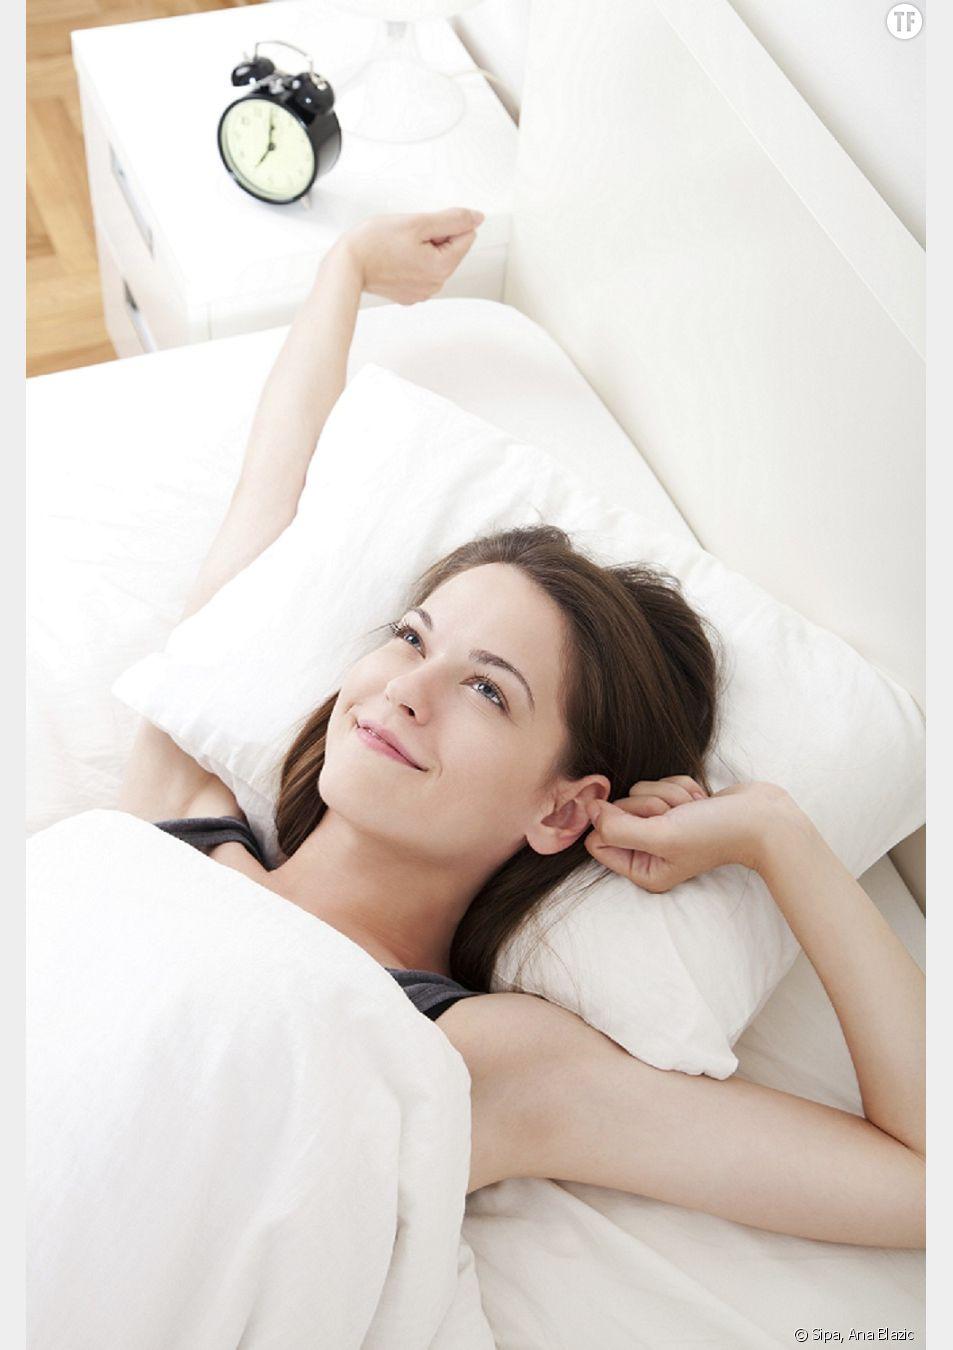 Femme heureuse au réveil